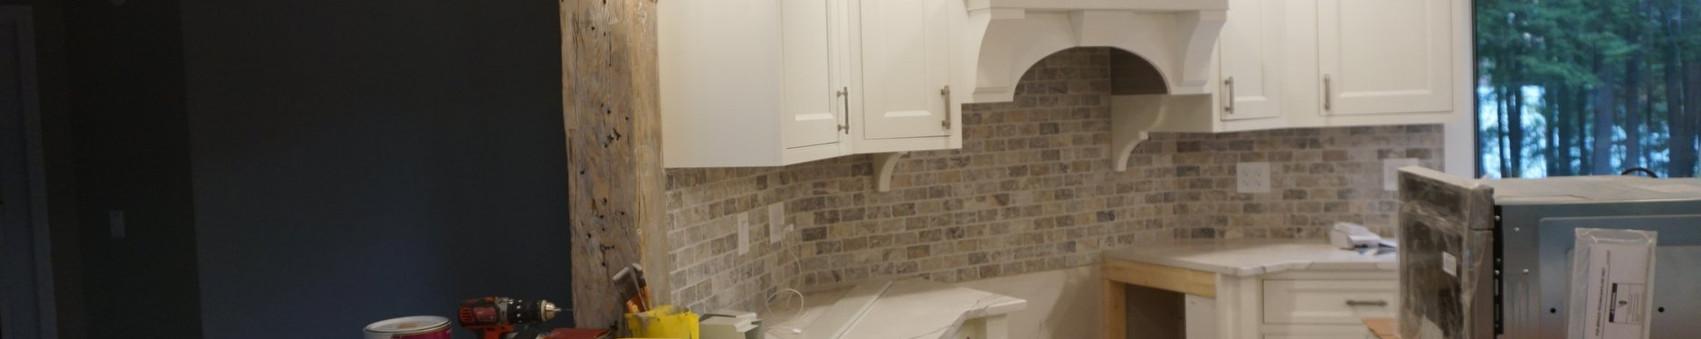 mount vernon kitchen near done lighting